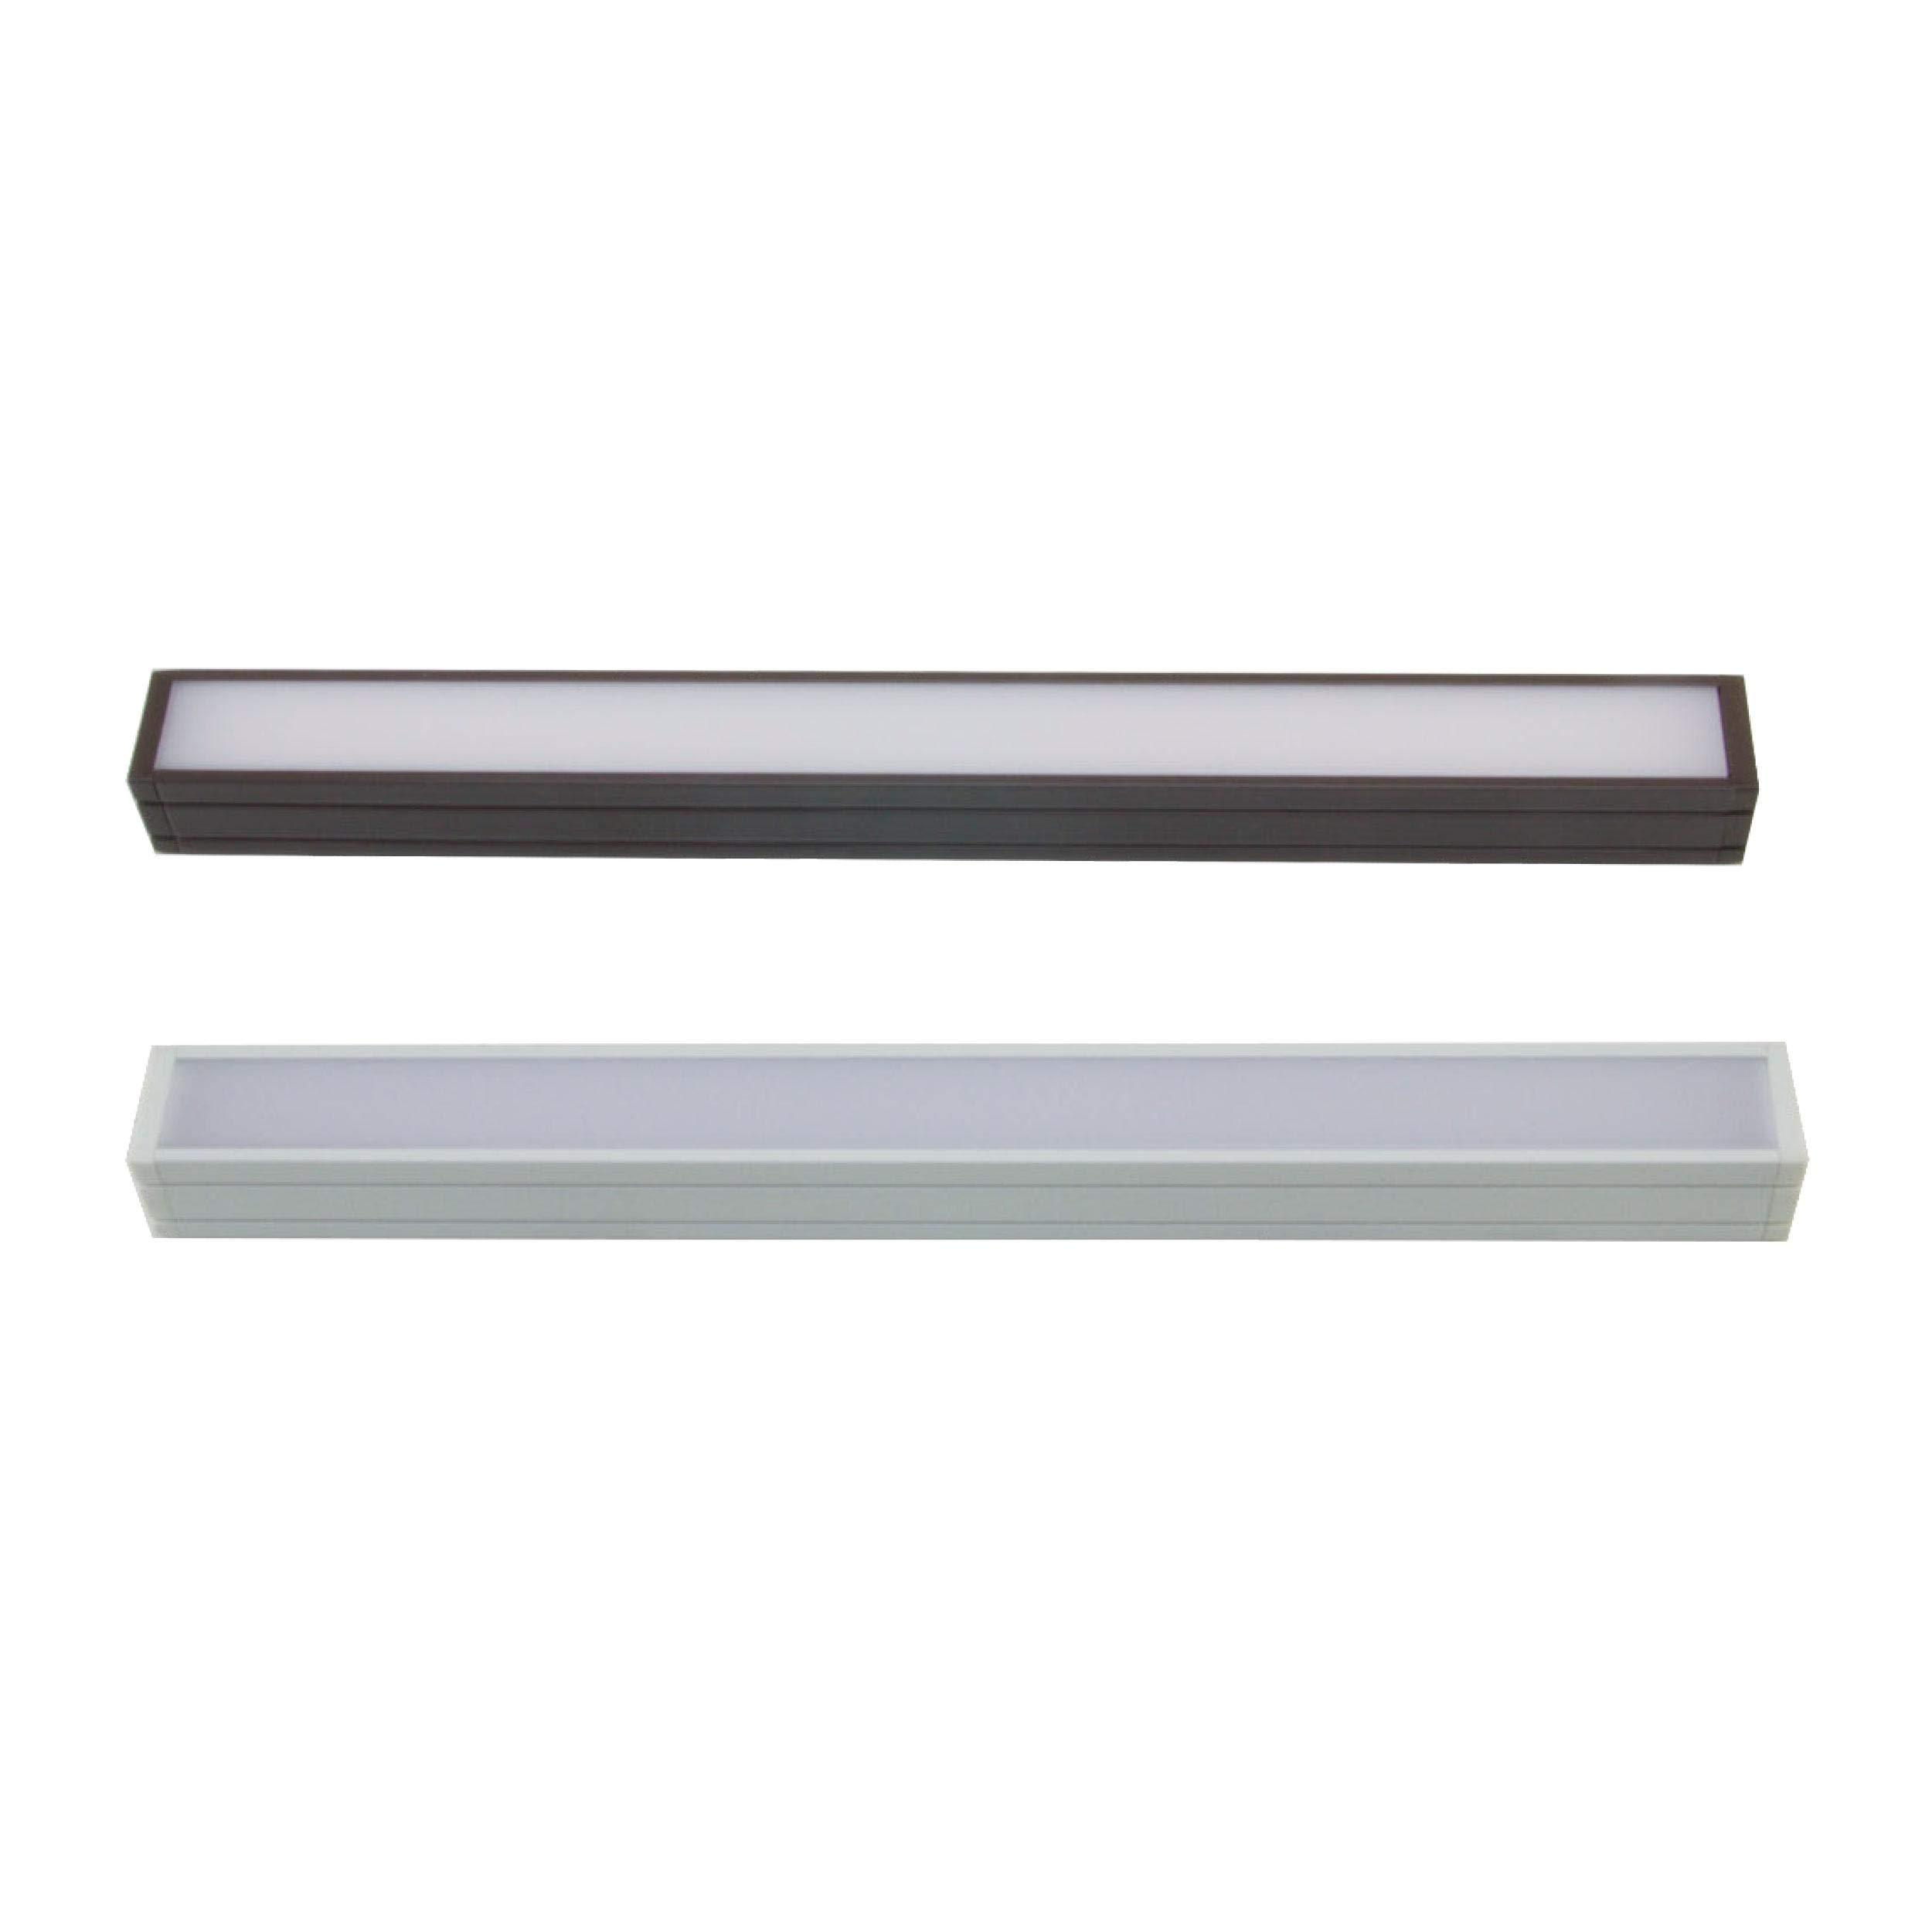 Diode LED Fencer Series FOIL 2 Premium Diffusion Fixture 120V 3000K 90 CRI Dark Bronze 12 in